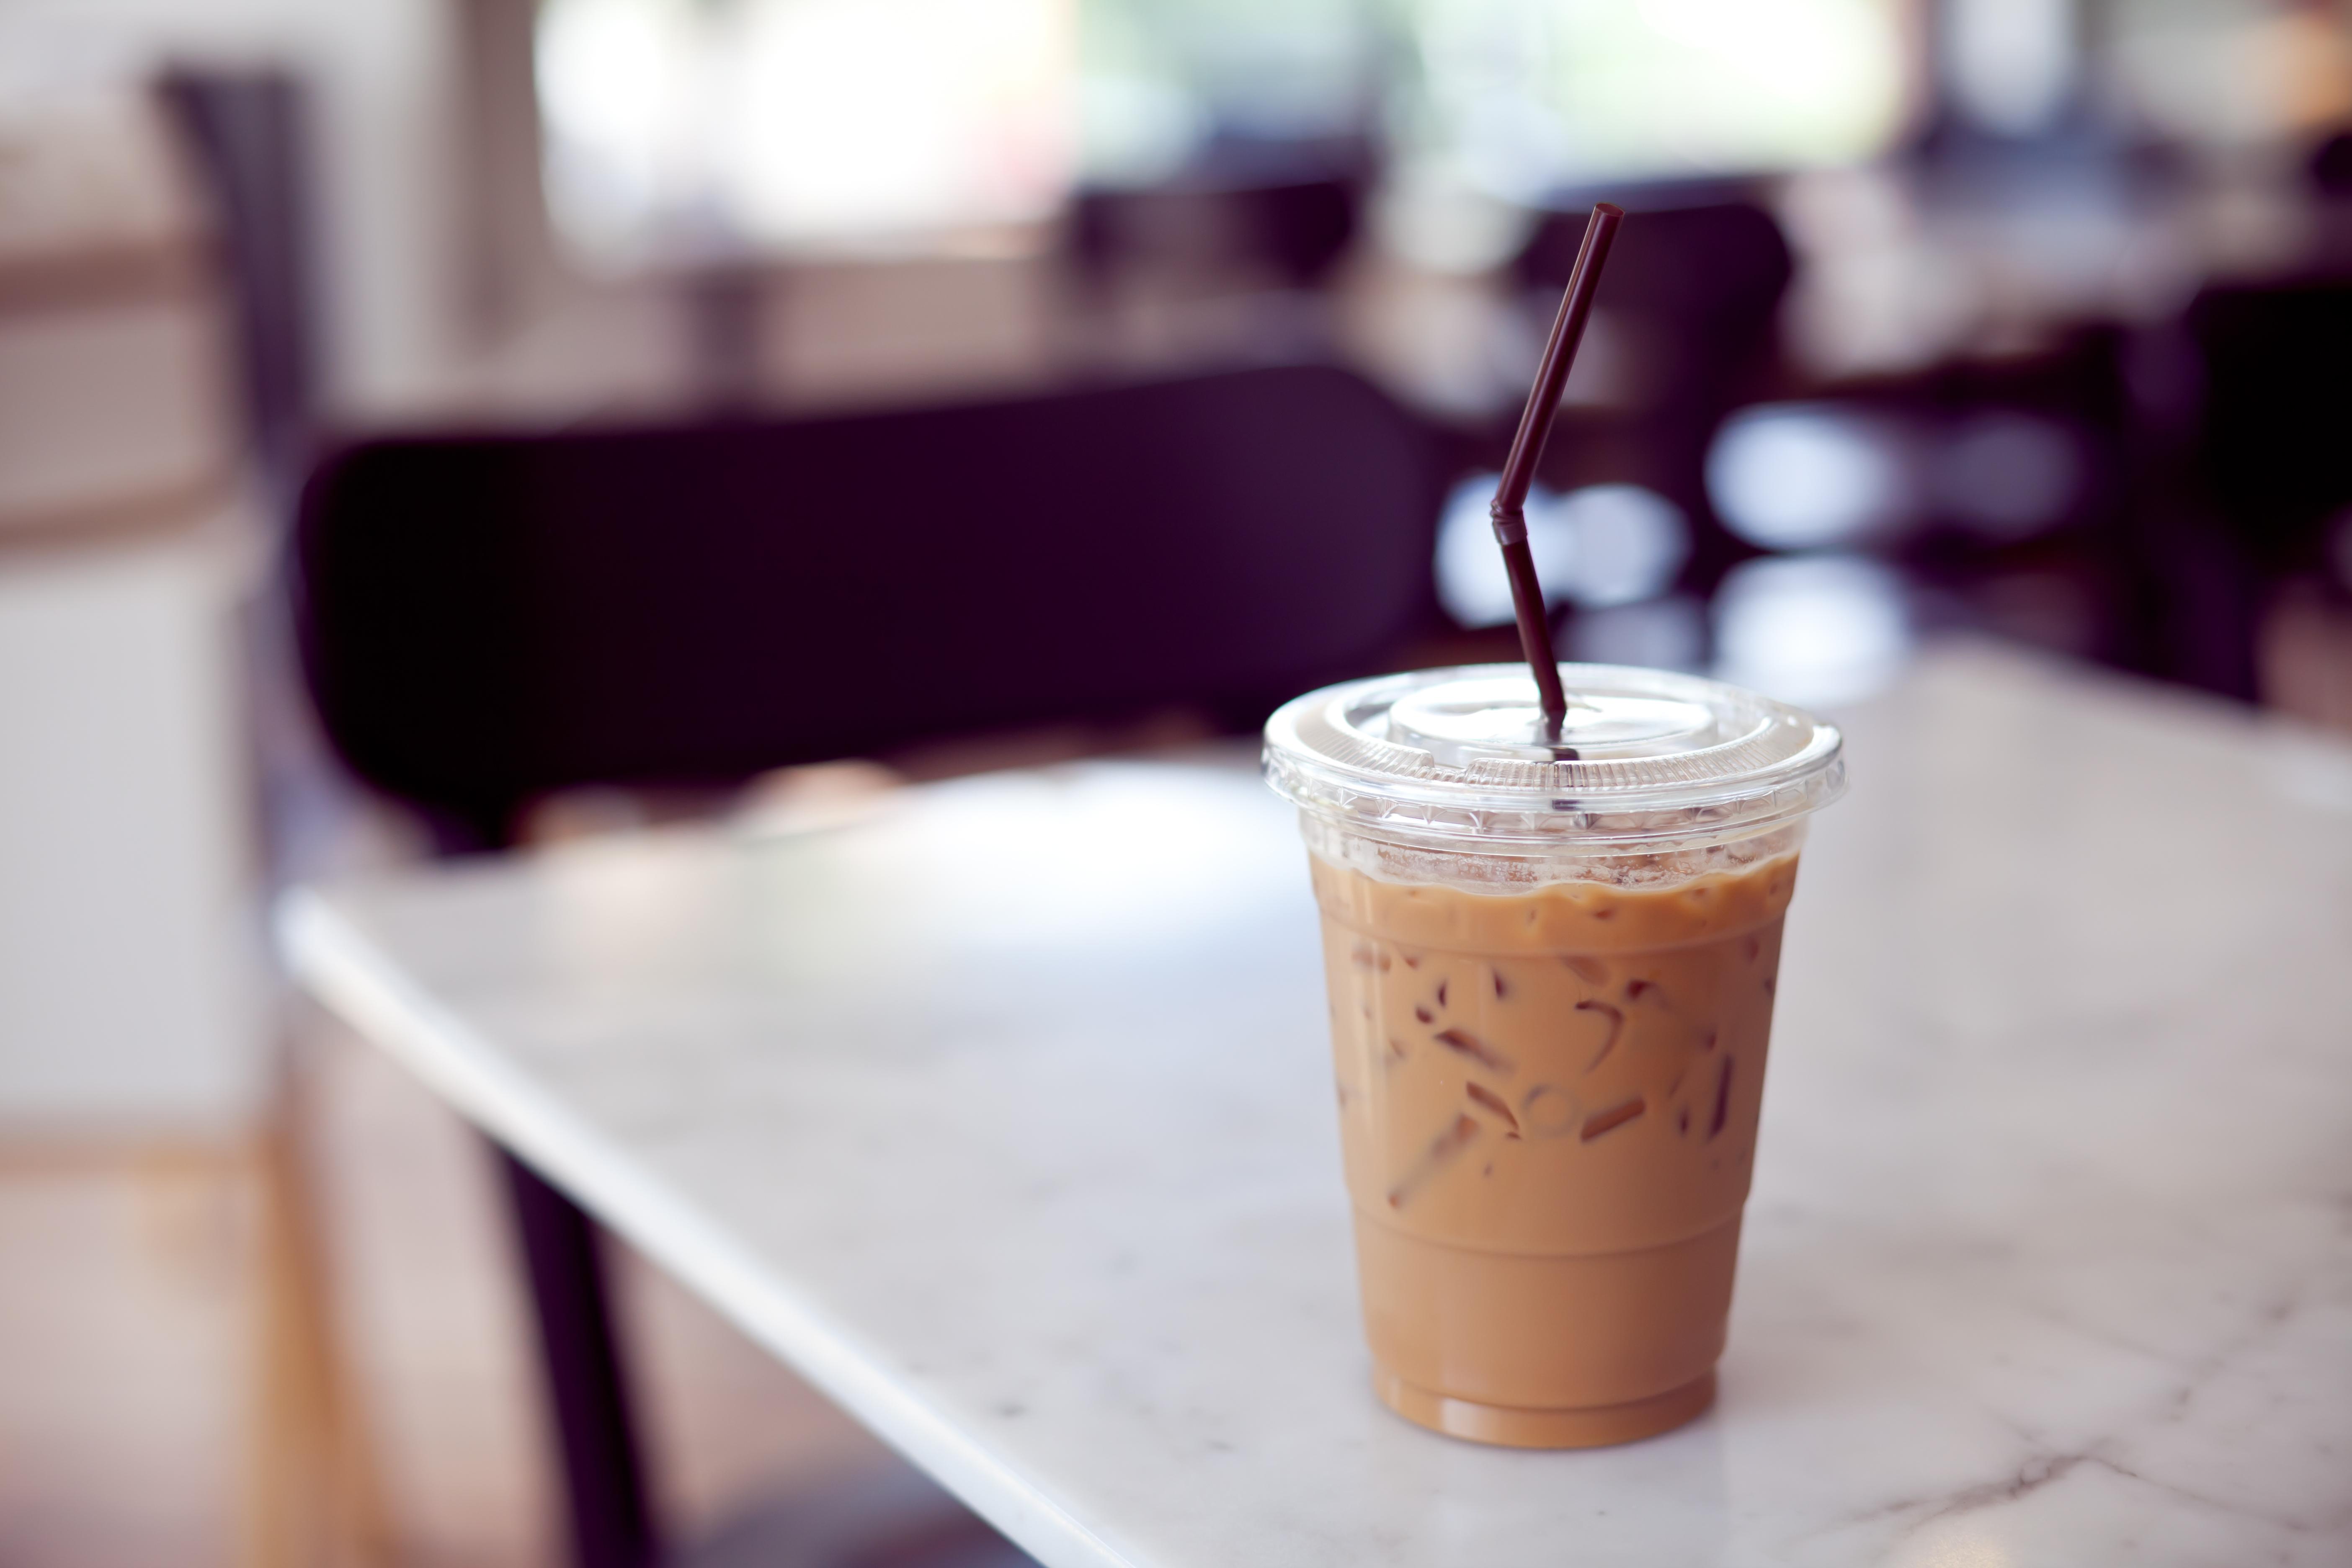 Intestinal bacteria like coffee and drink 61